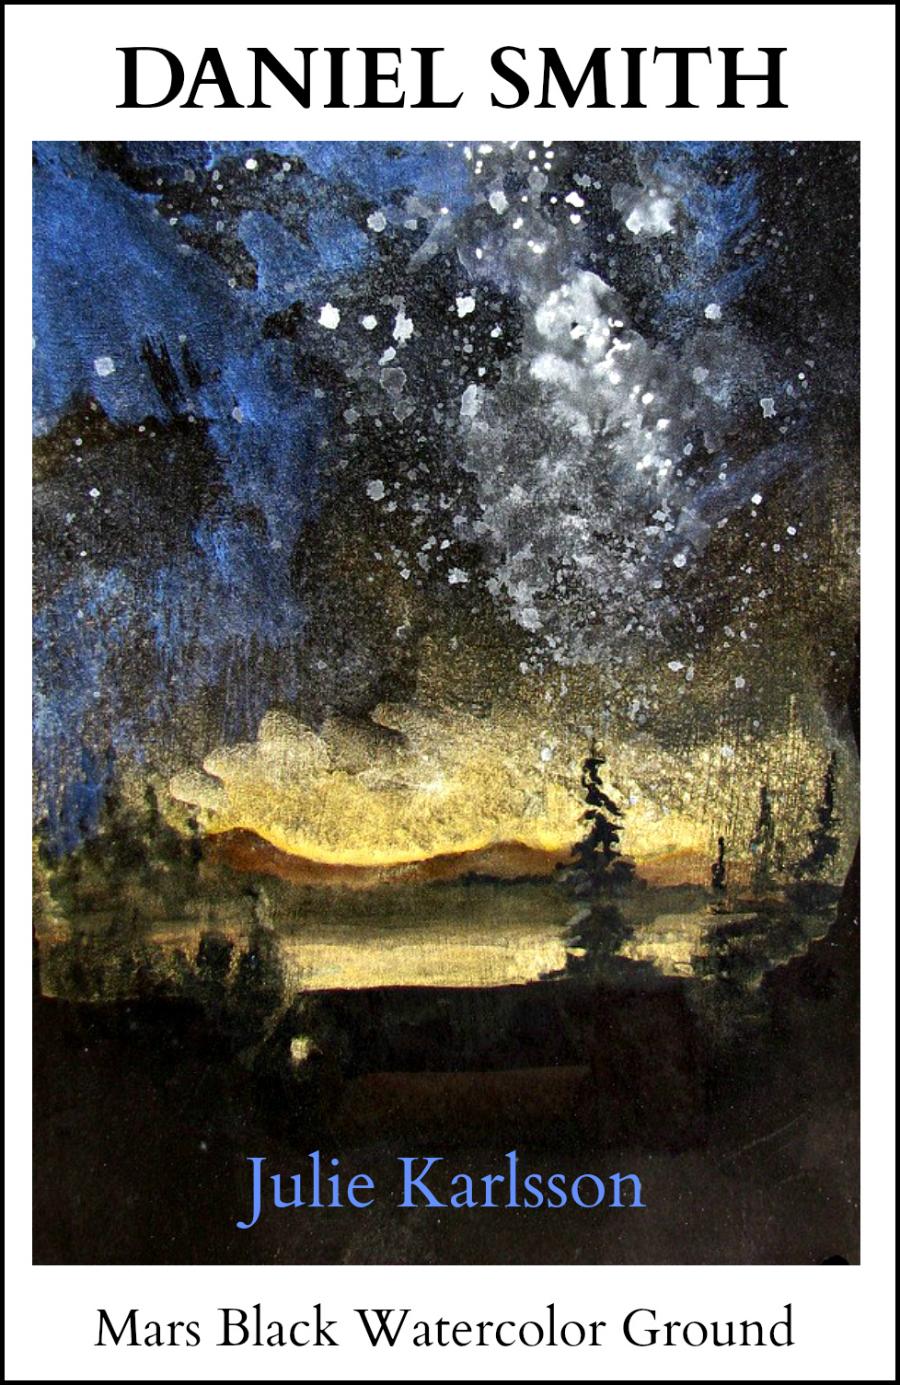 900x1385 Daniel Smith Mars Black Watercolor Ground Recycle A Watercolor